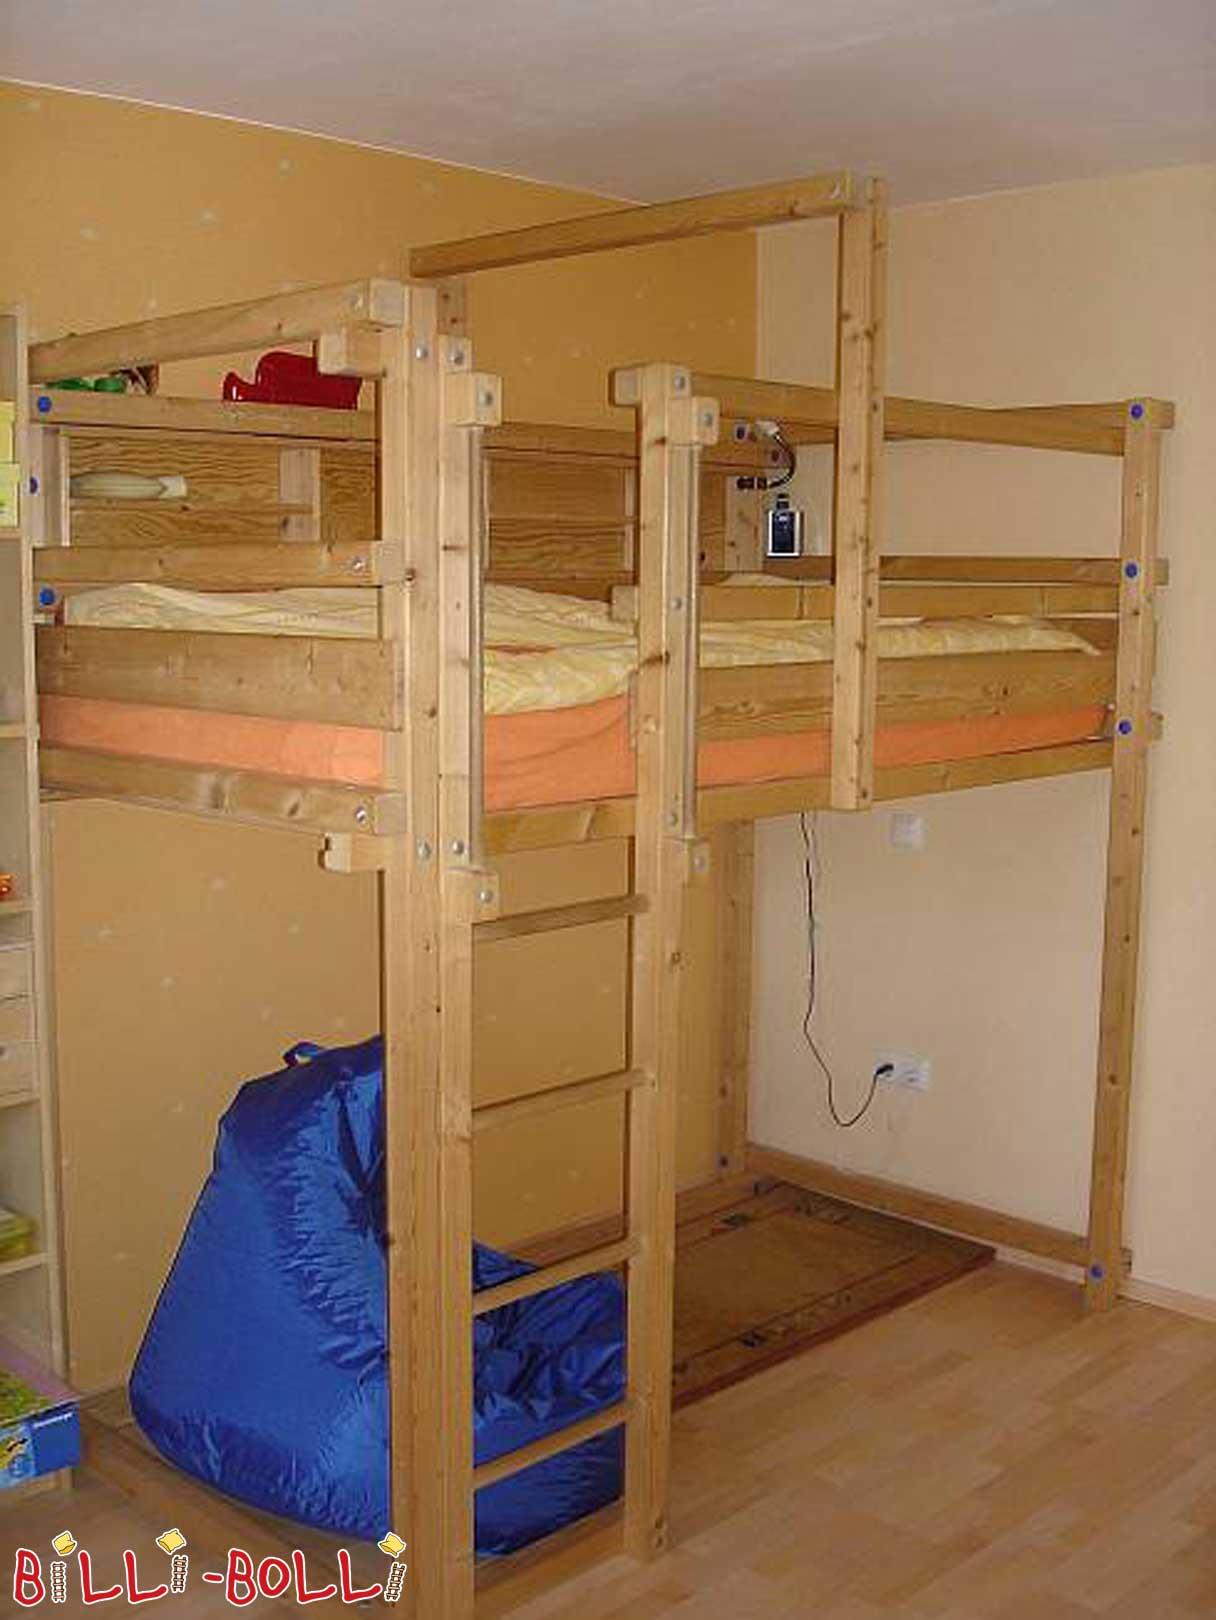 Secondhand page 125 billi bolli kids furniture for Billi bolli hochbett